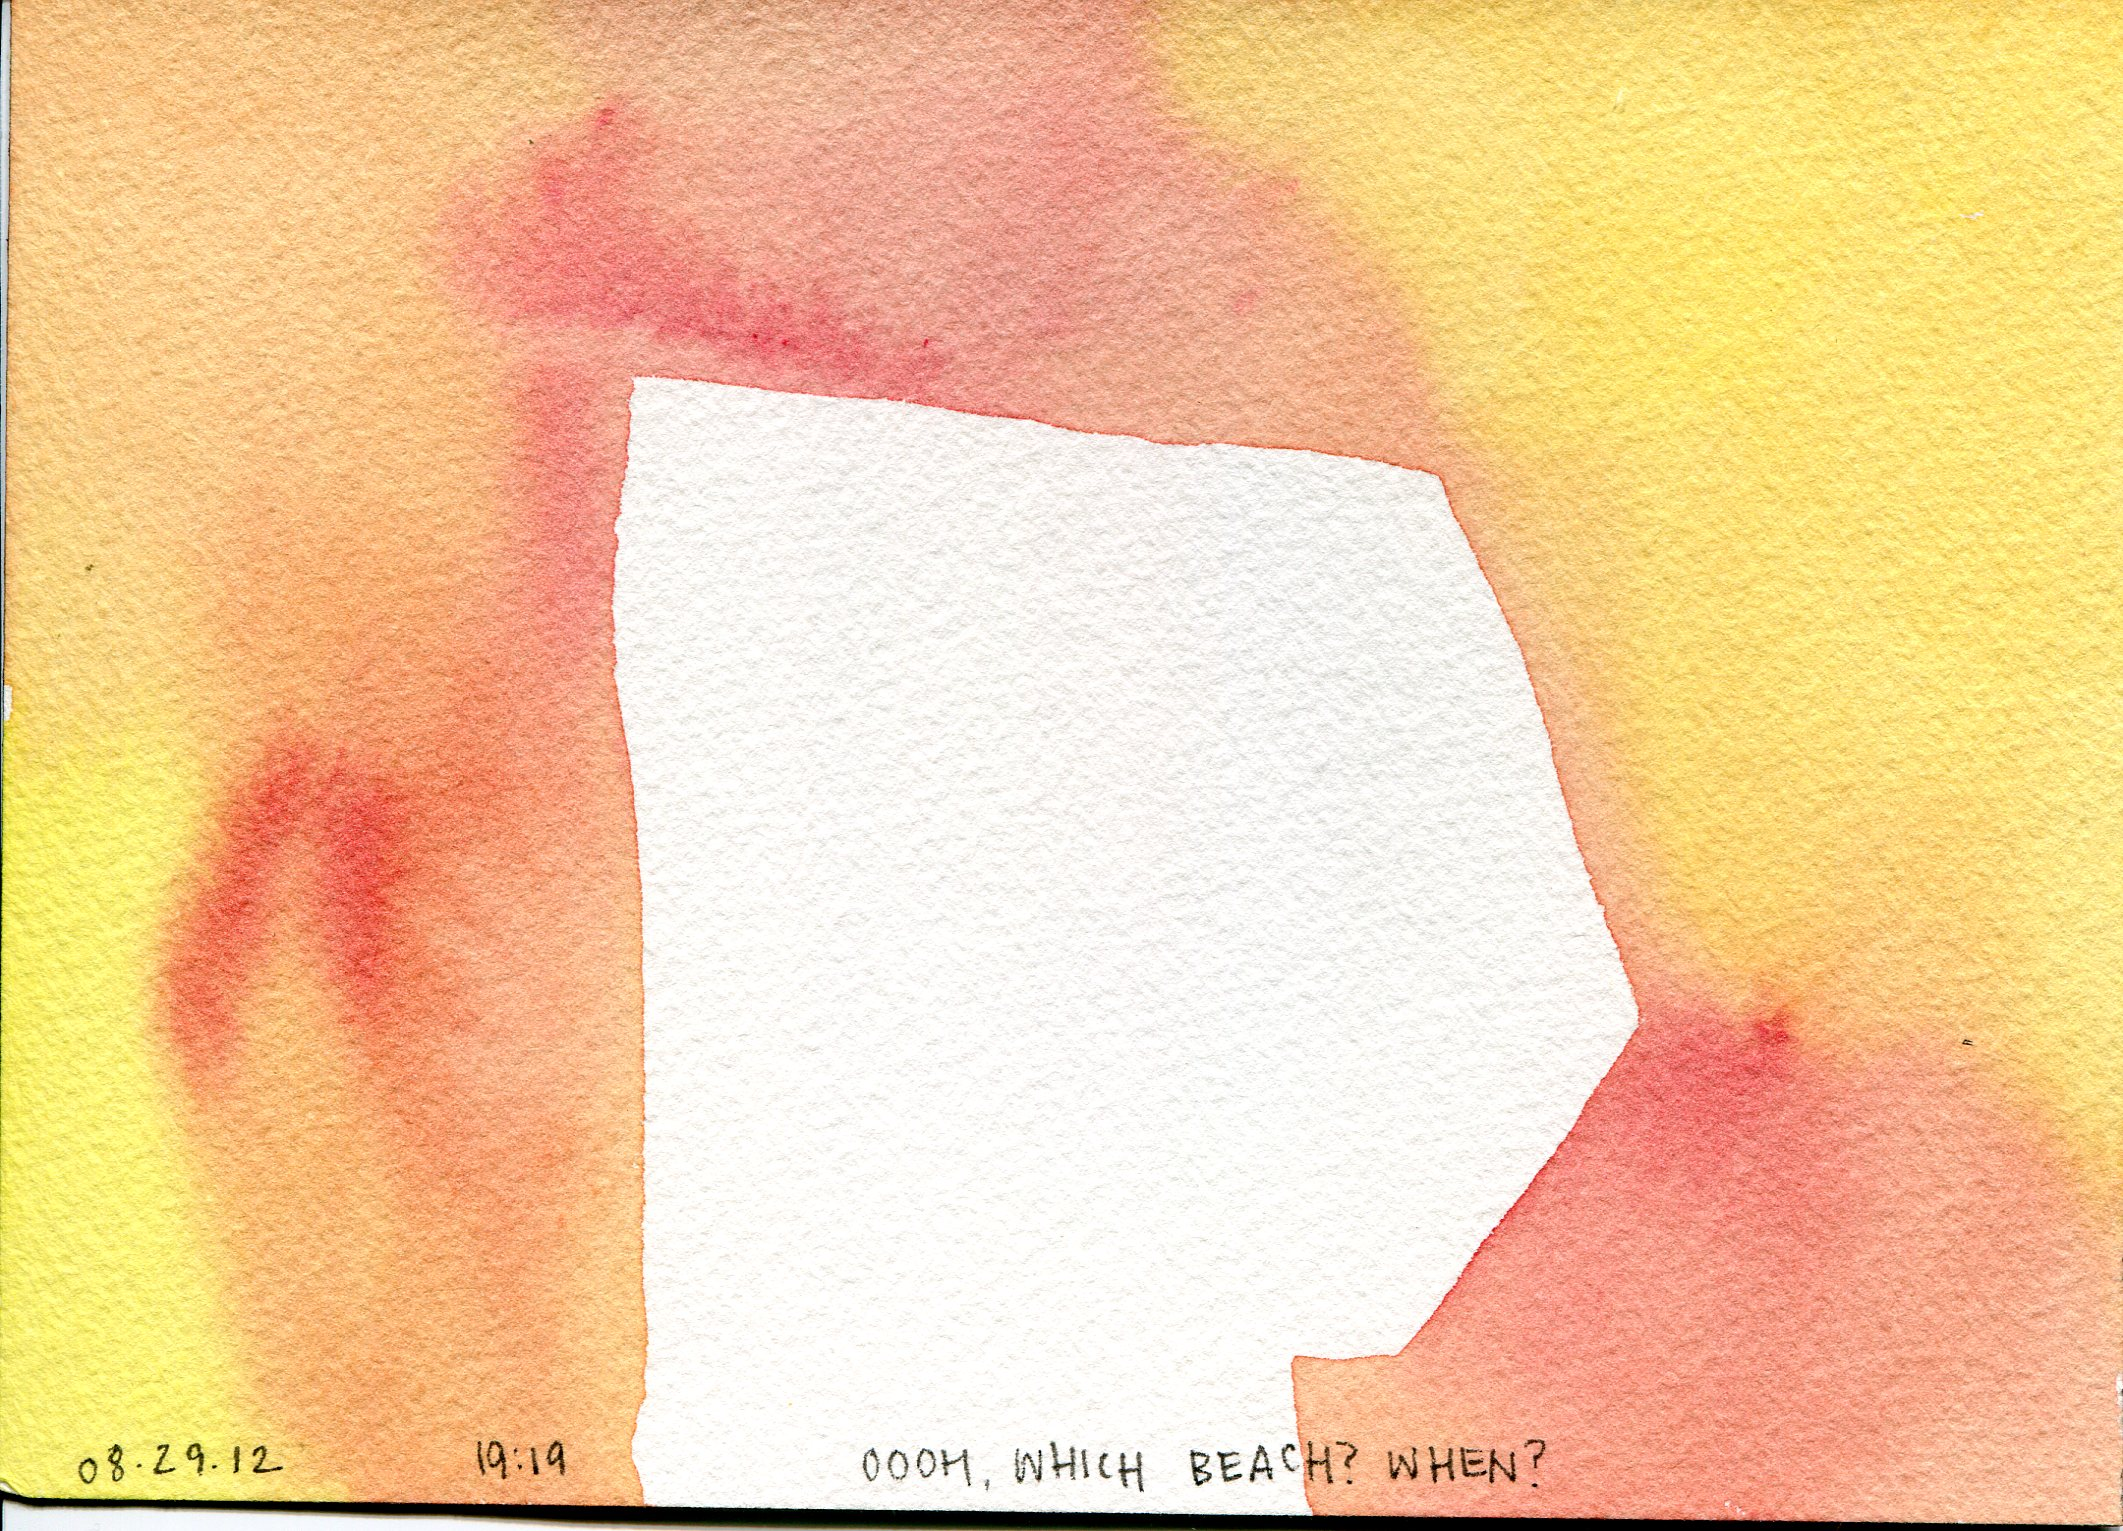 2012-09-03 drawing004.jpg